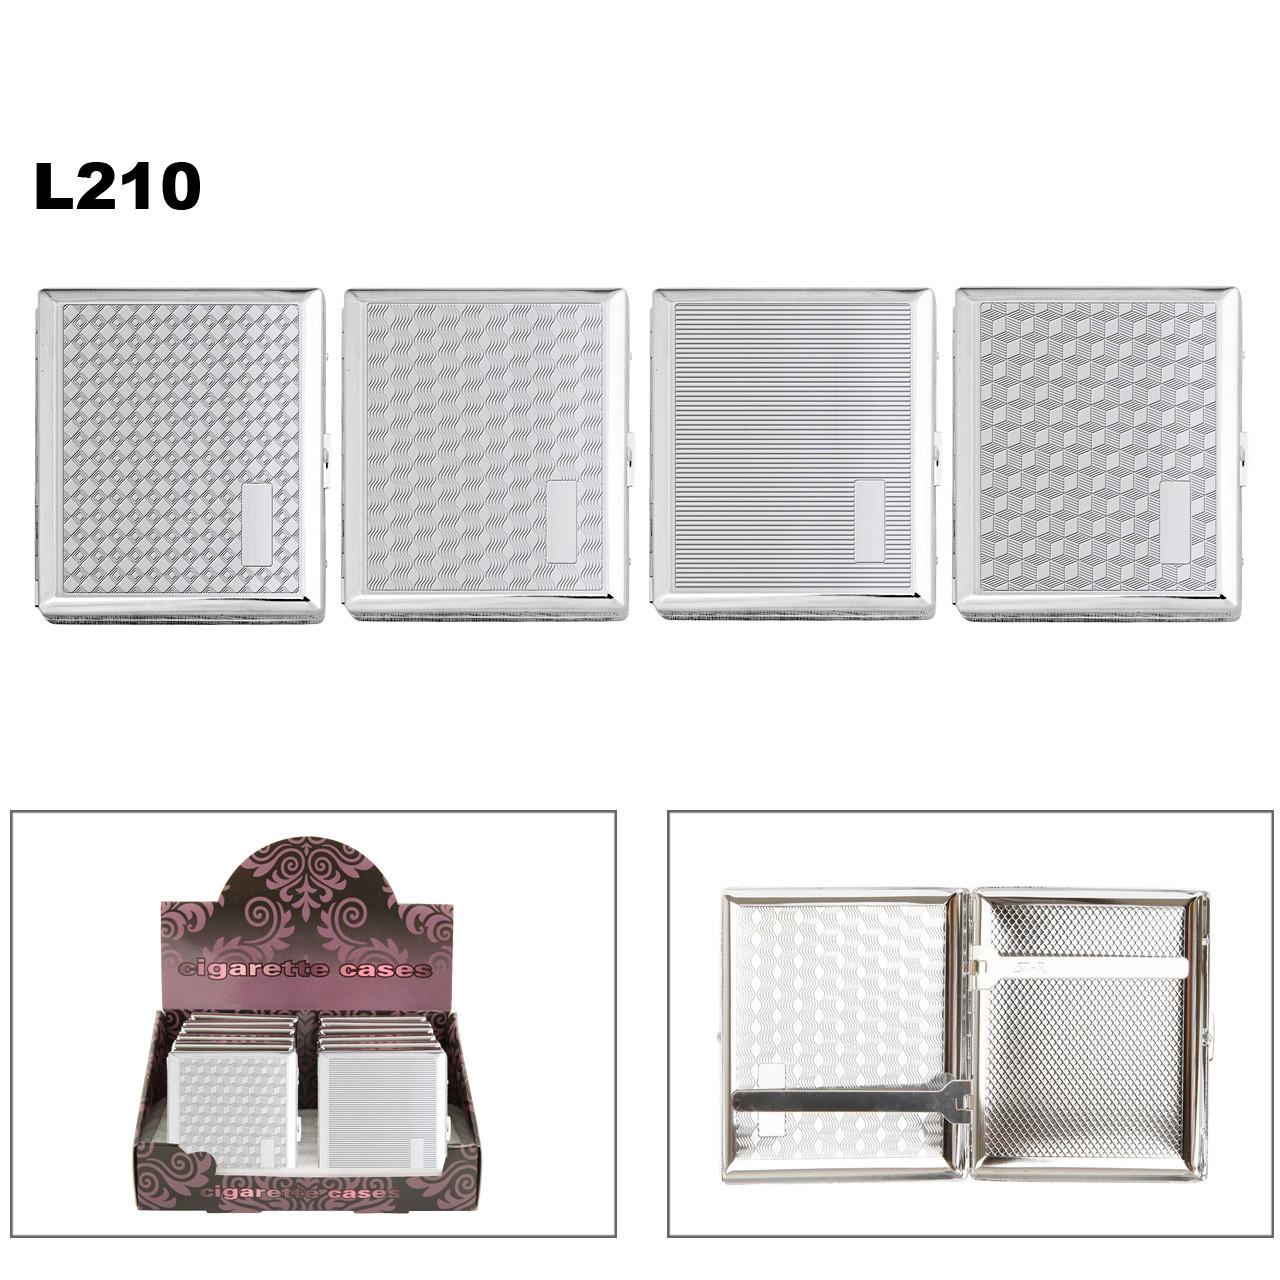 Patterned Chrome Cigarette Cases L210